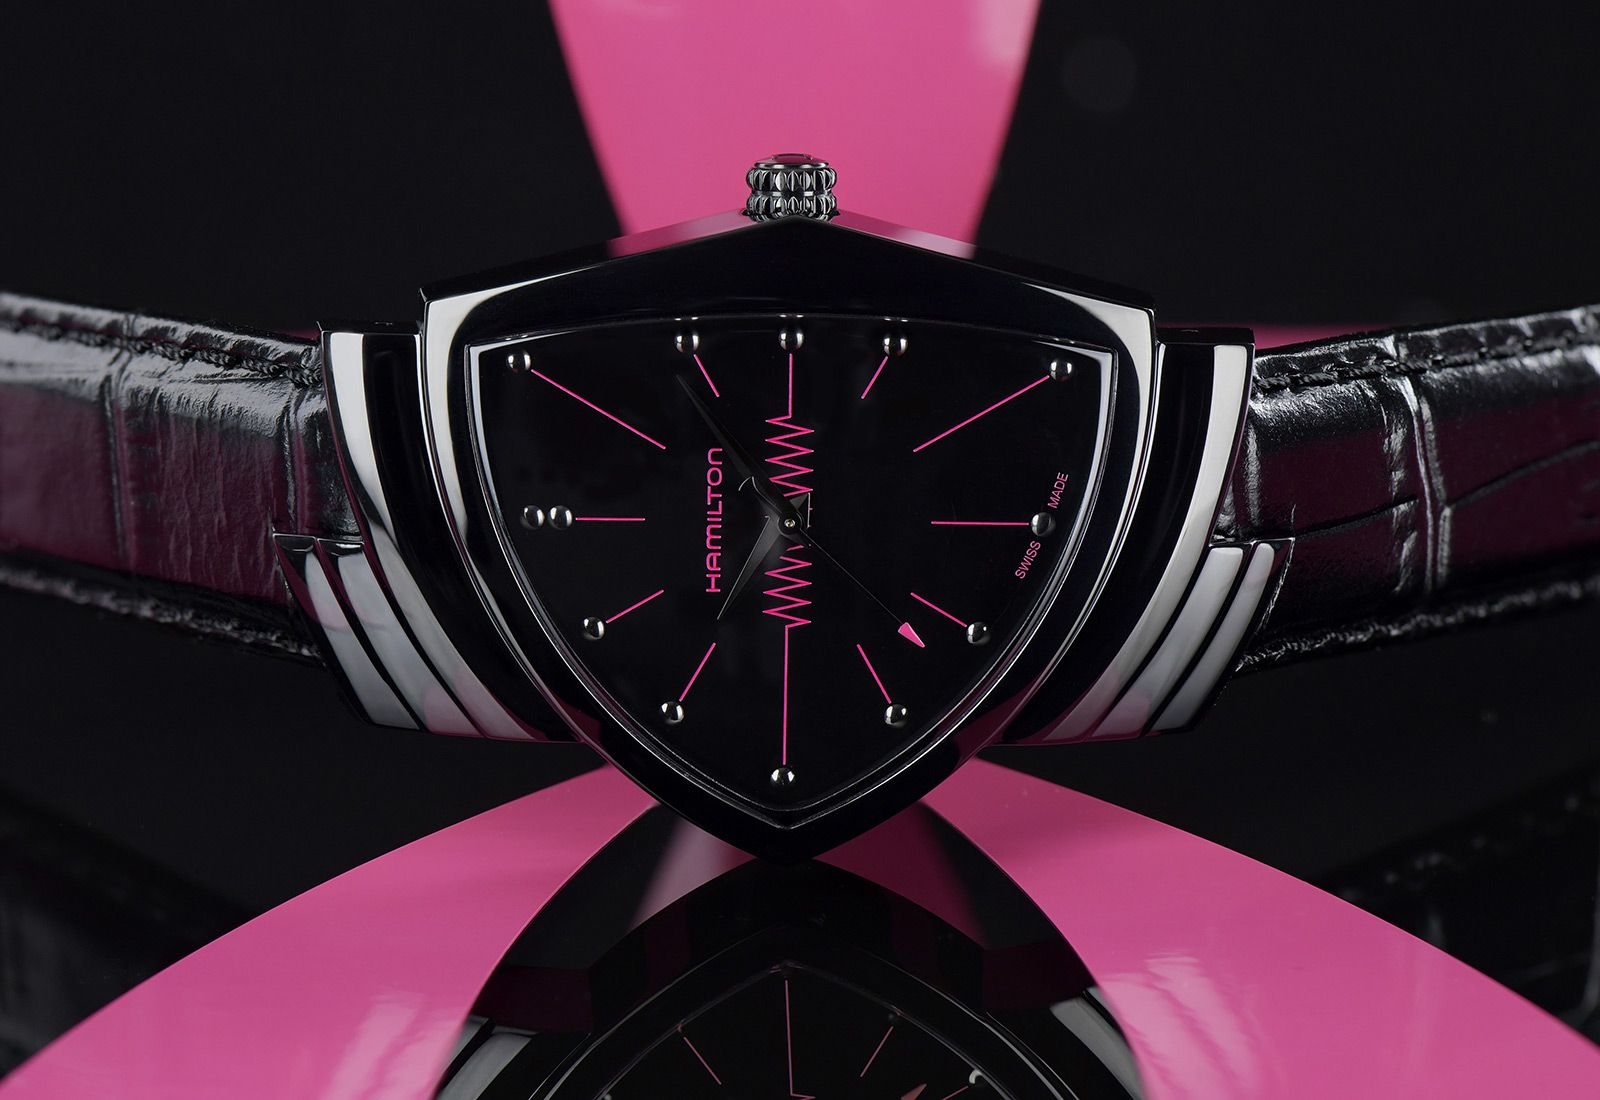 hamilton-poggy-watch-010